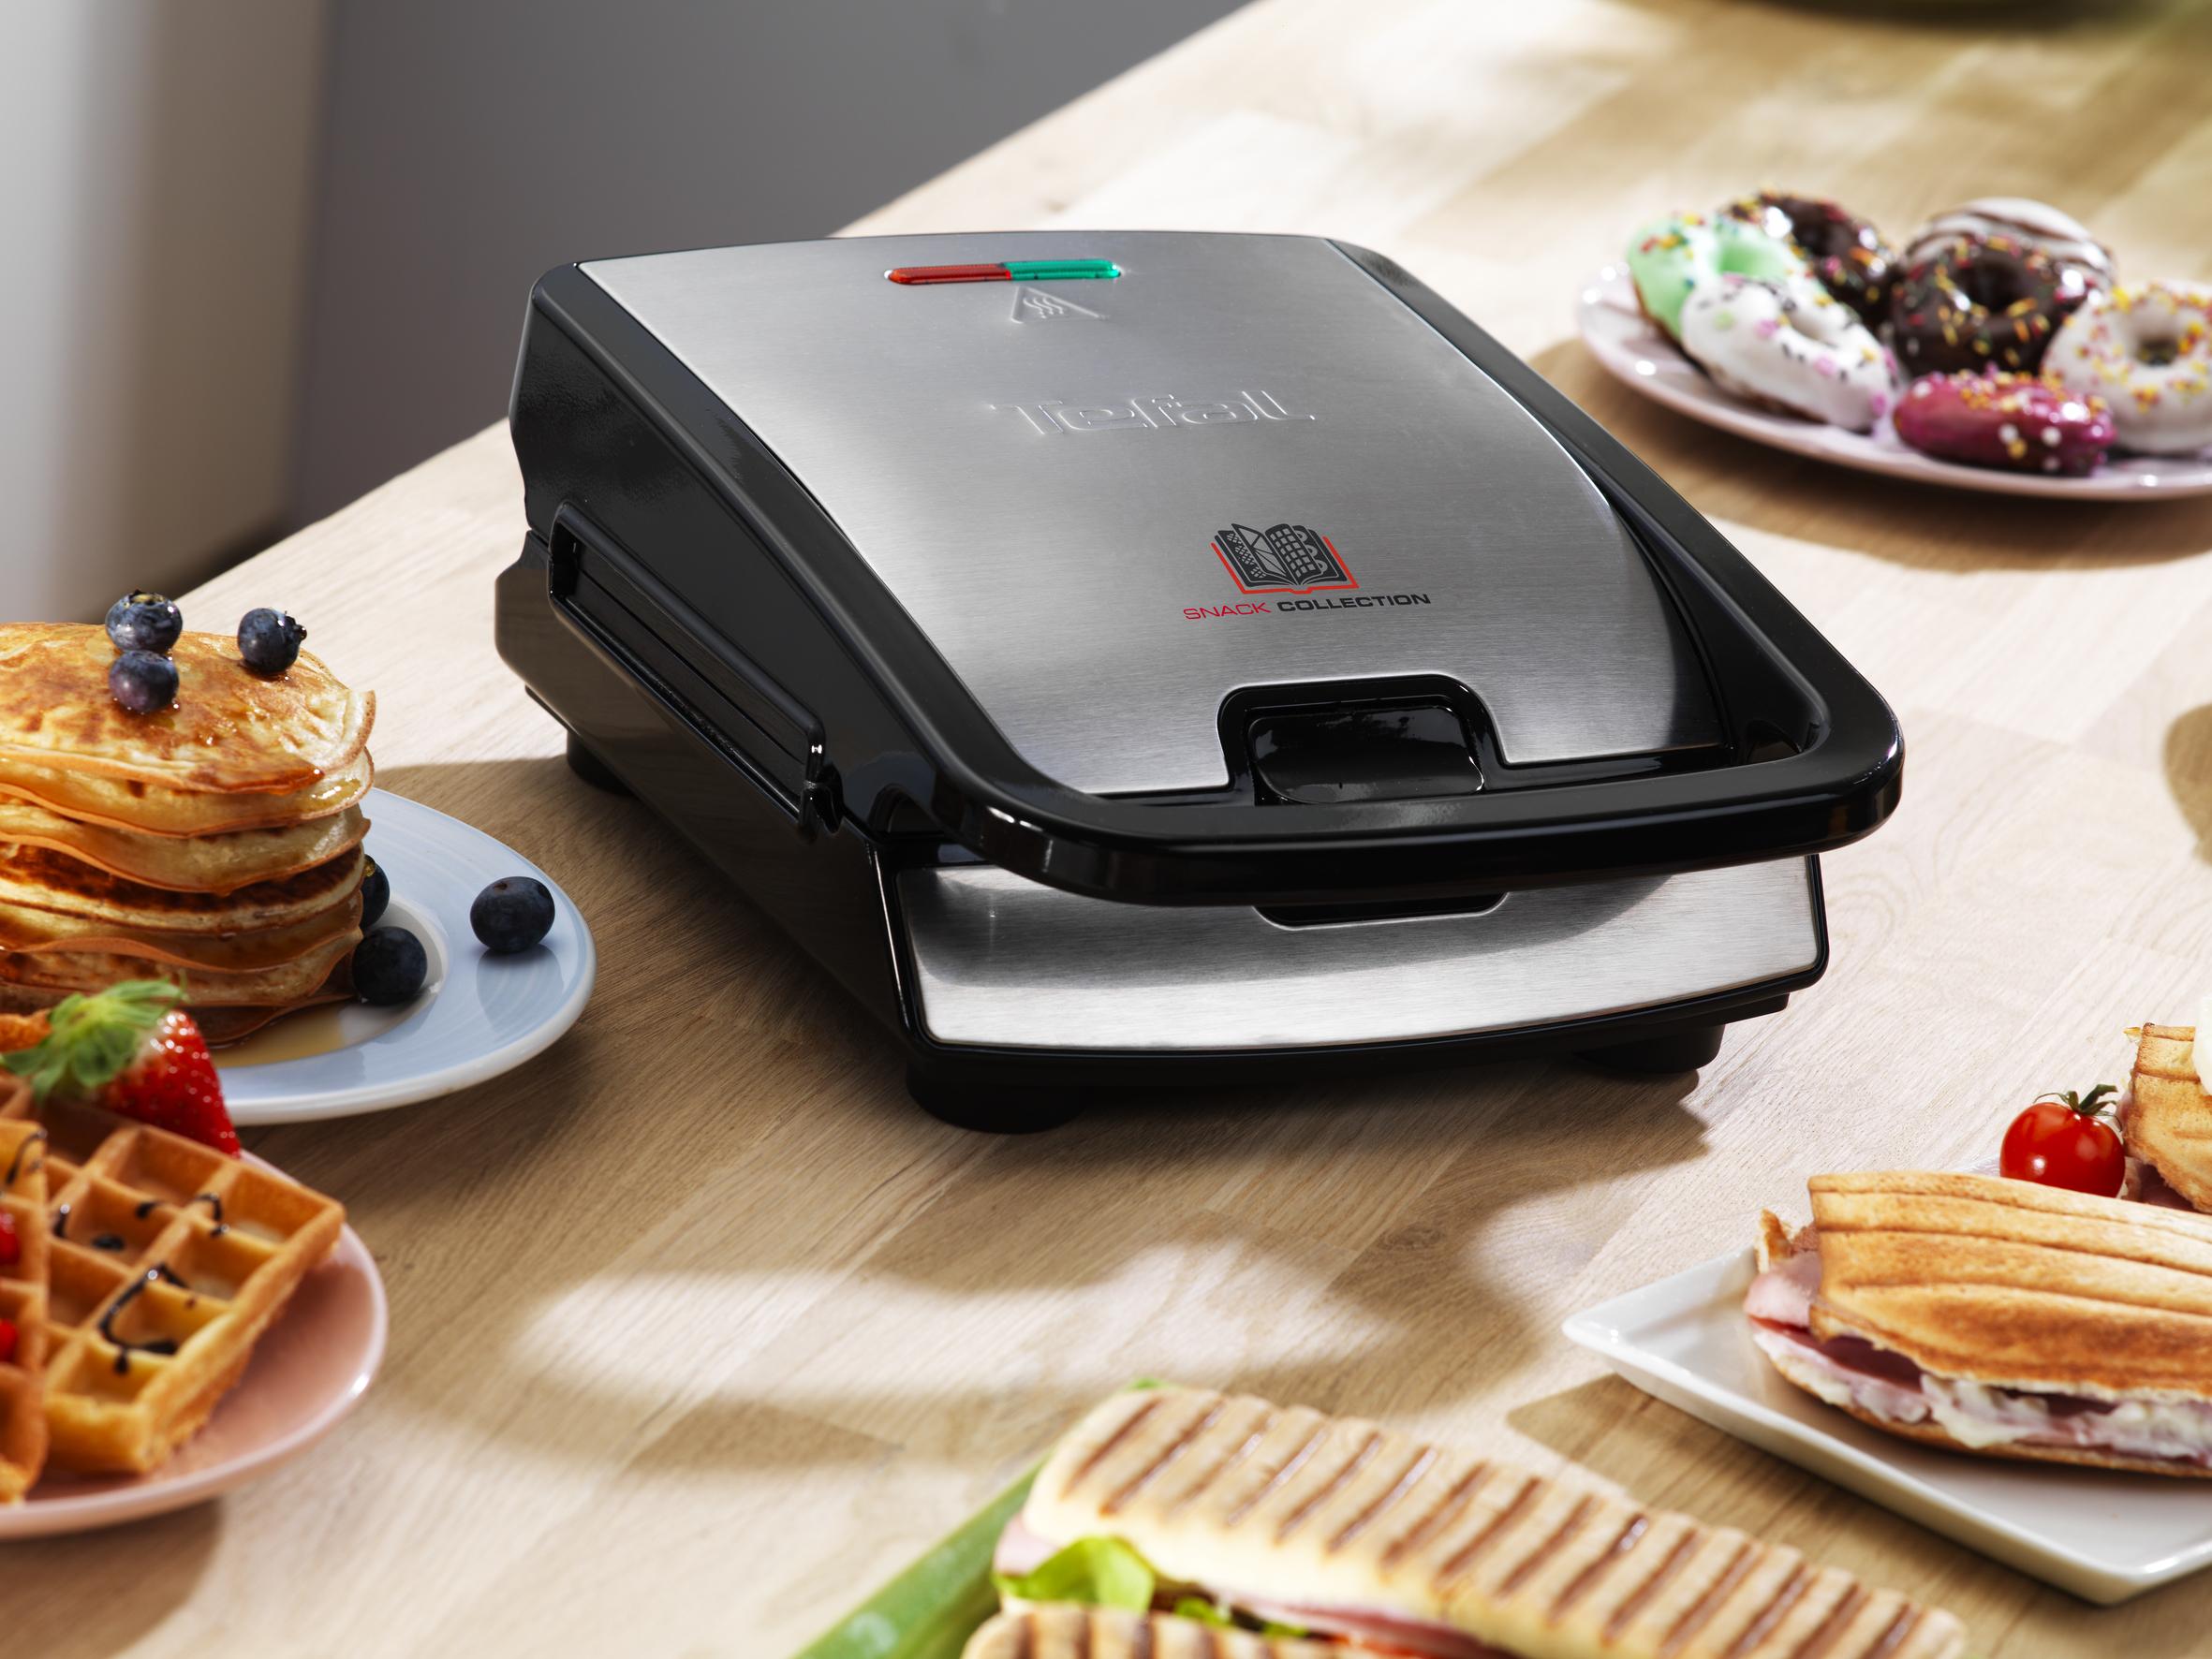 TEFAL-Snack-collection-Sandwich-maker-waffle-maker-700-W-black-stainle-SW852D miniatura 4